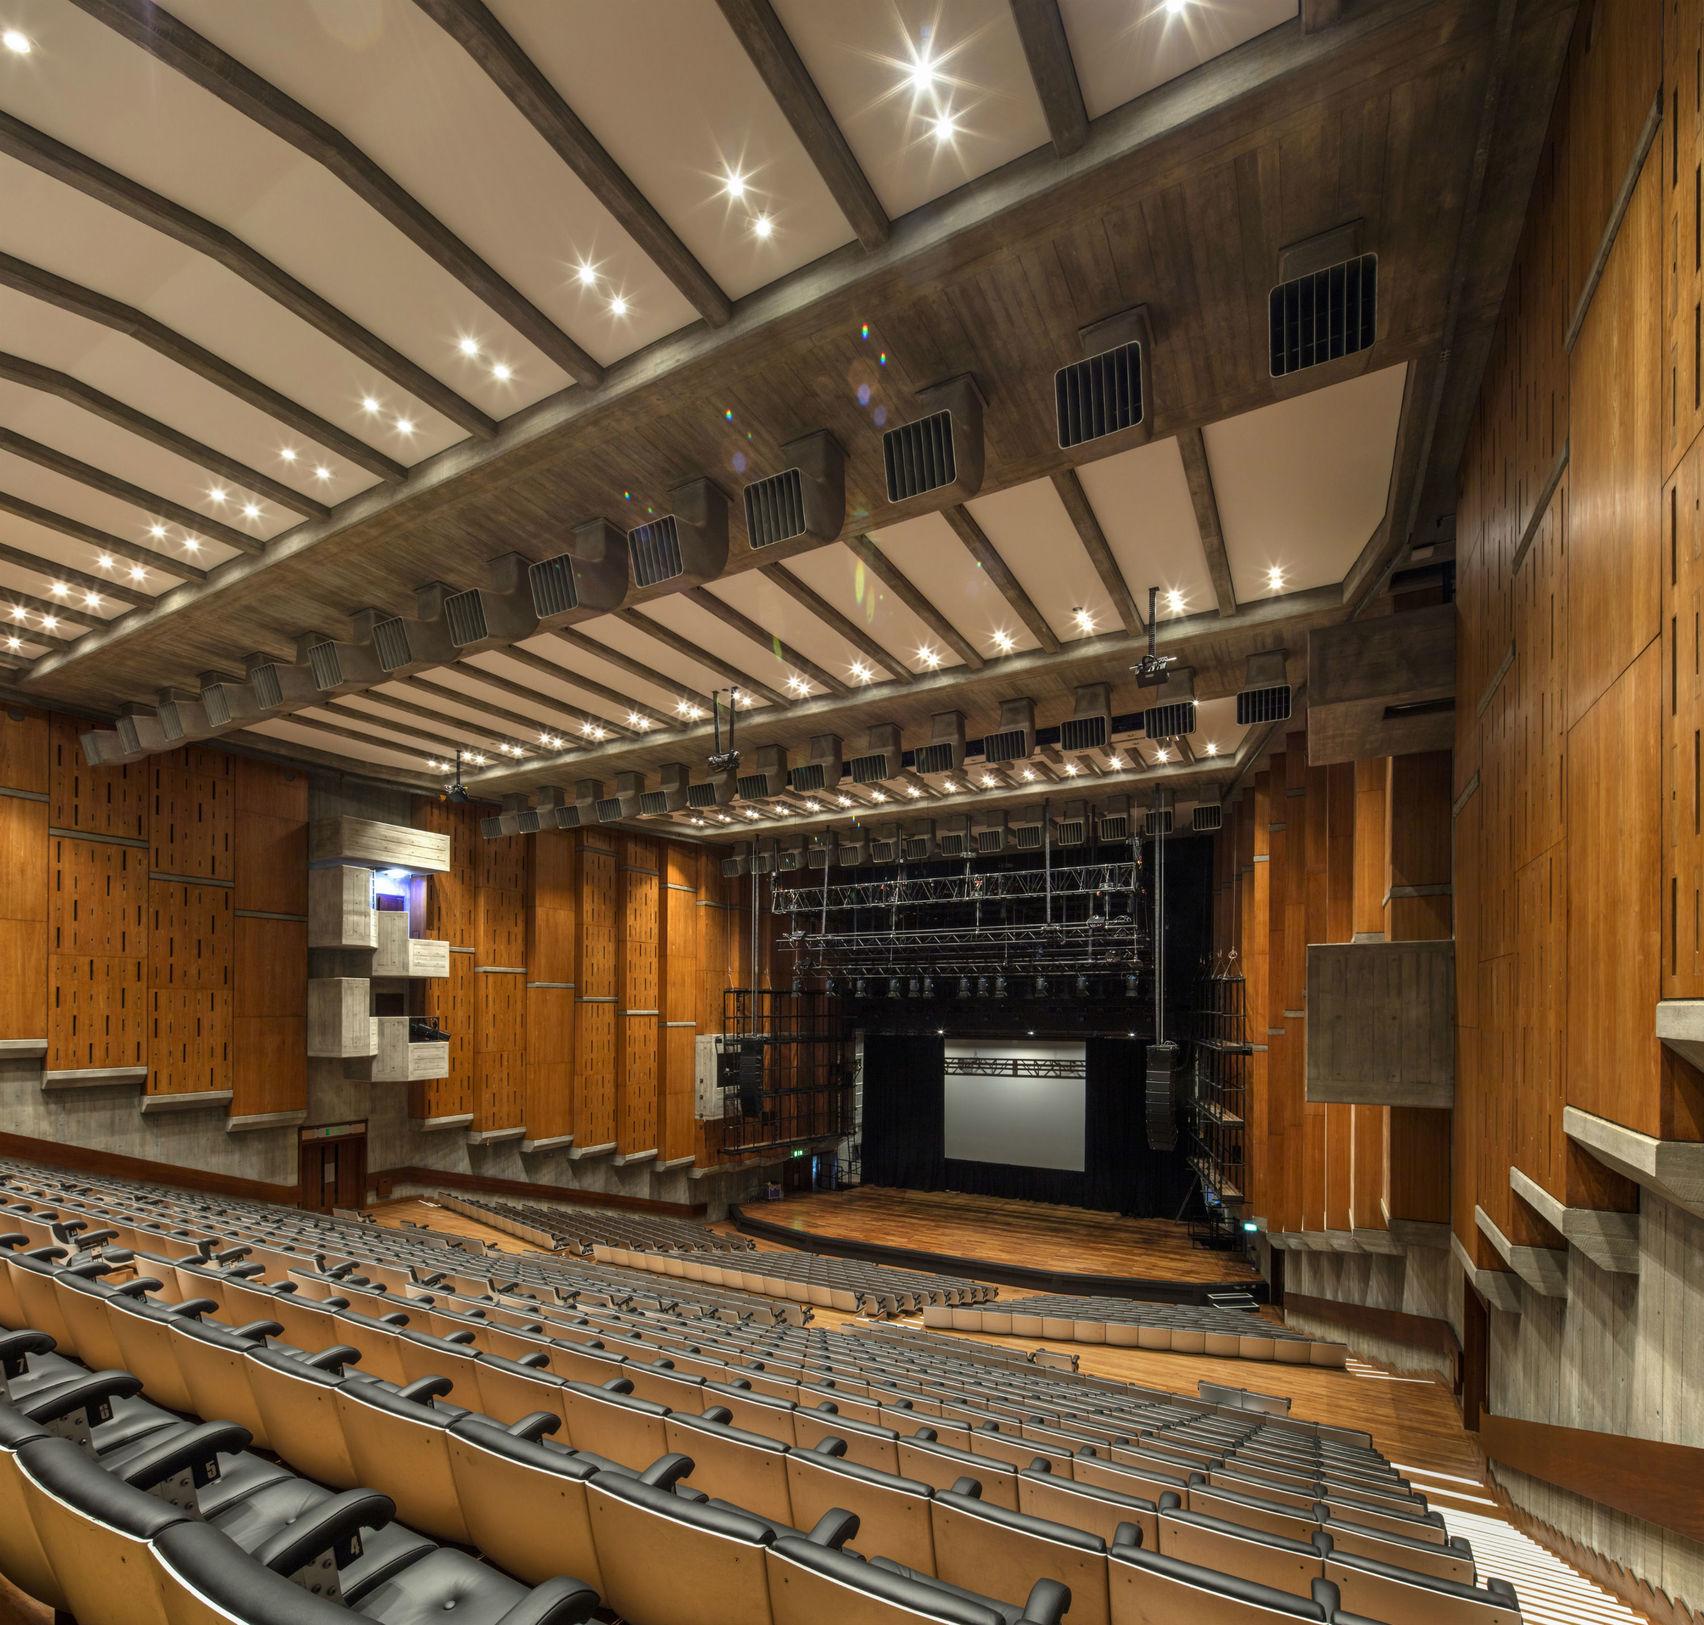 Queen Elizabeth Hall Auditorium, Southbank Centre